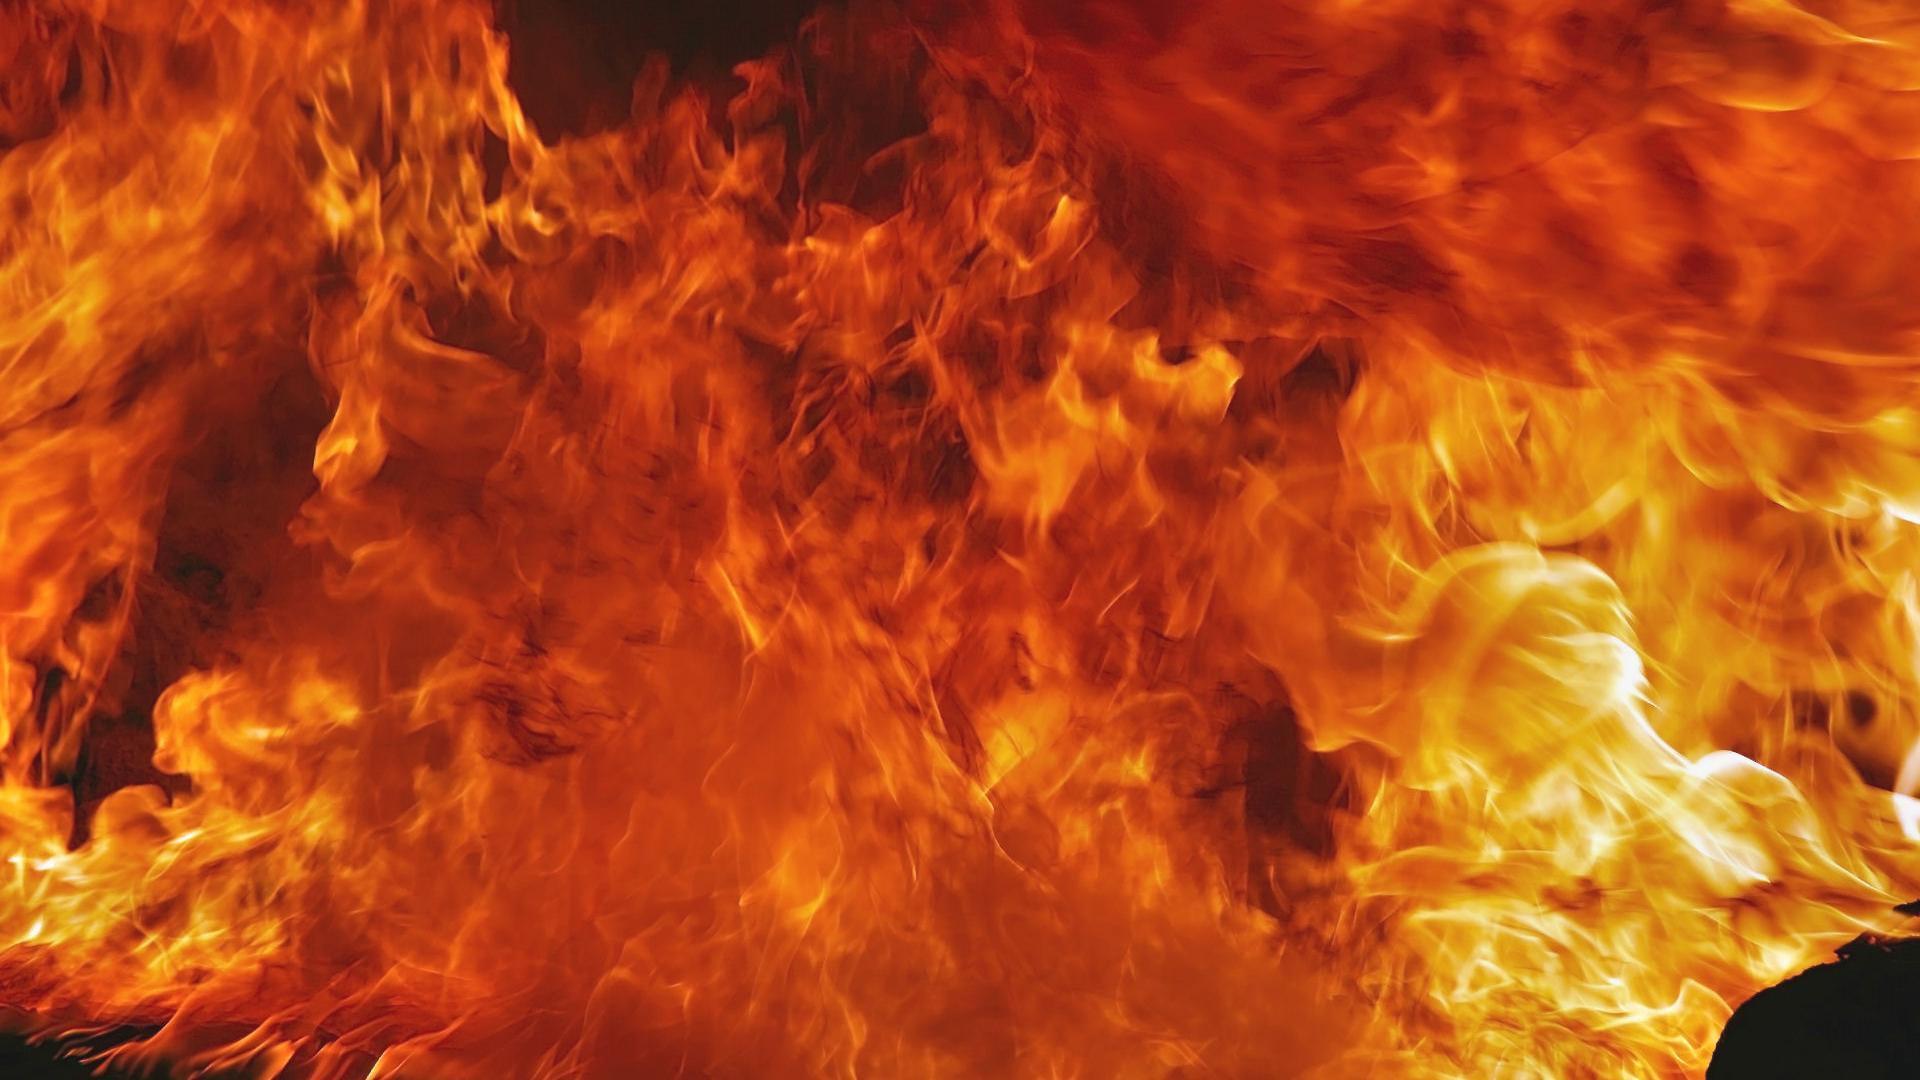 Fire Wallpapers 5 - 1920 X 1080 | stmed.net